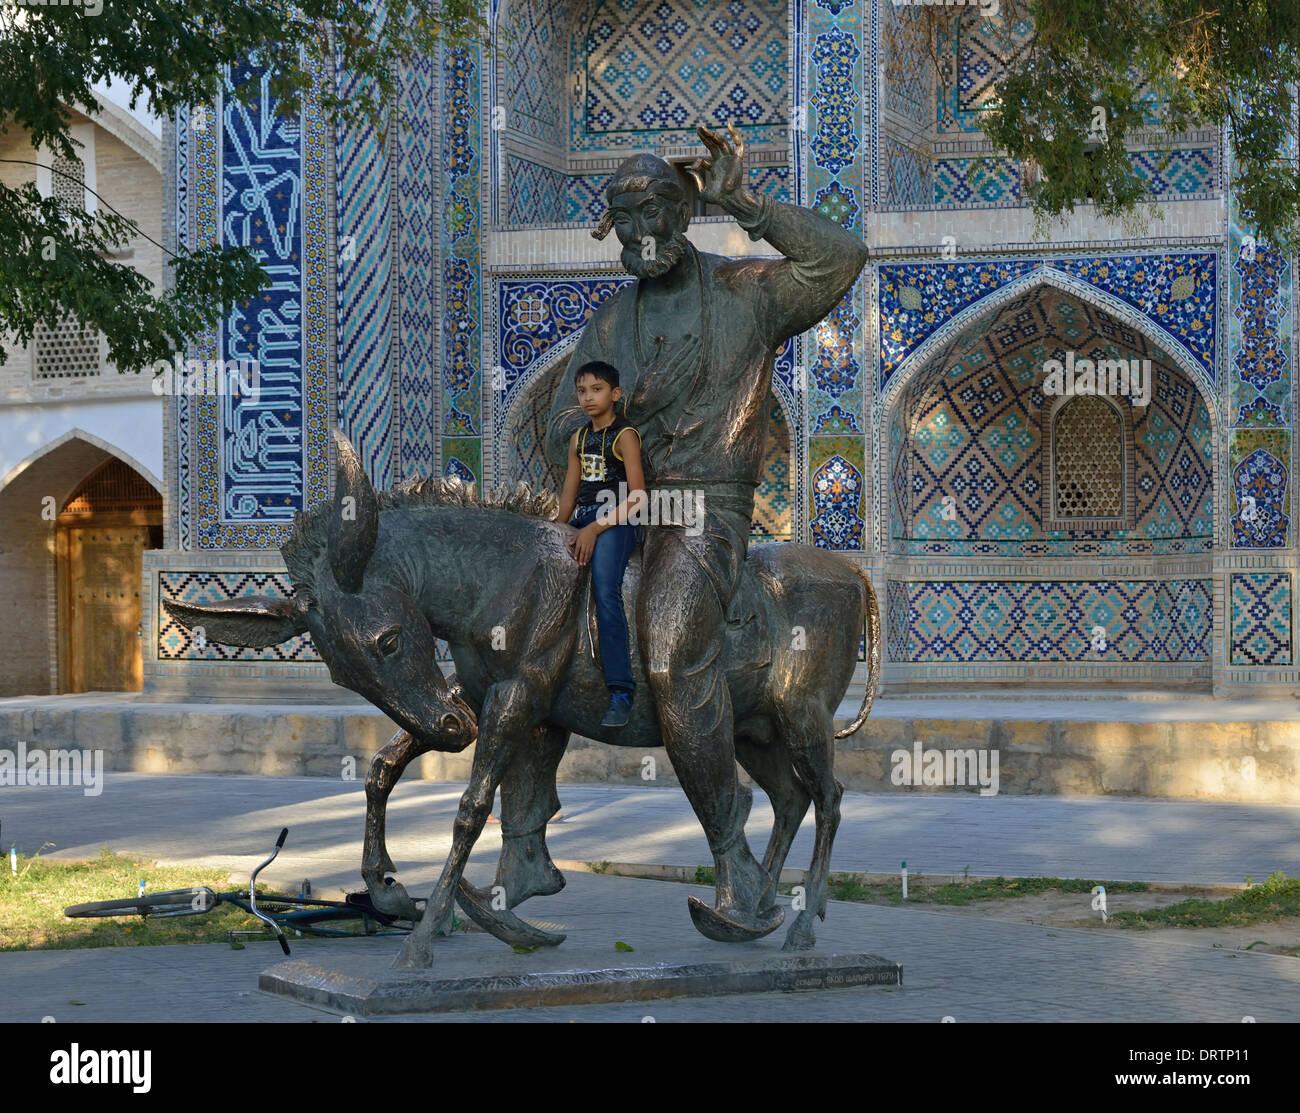 Young boy posing for a photo with Hodja Nasreddin statue, Lyabi Hauz Square Bukhara, UZbekistan - Stock Image